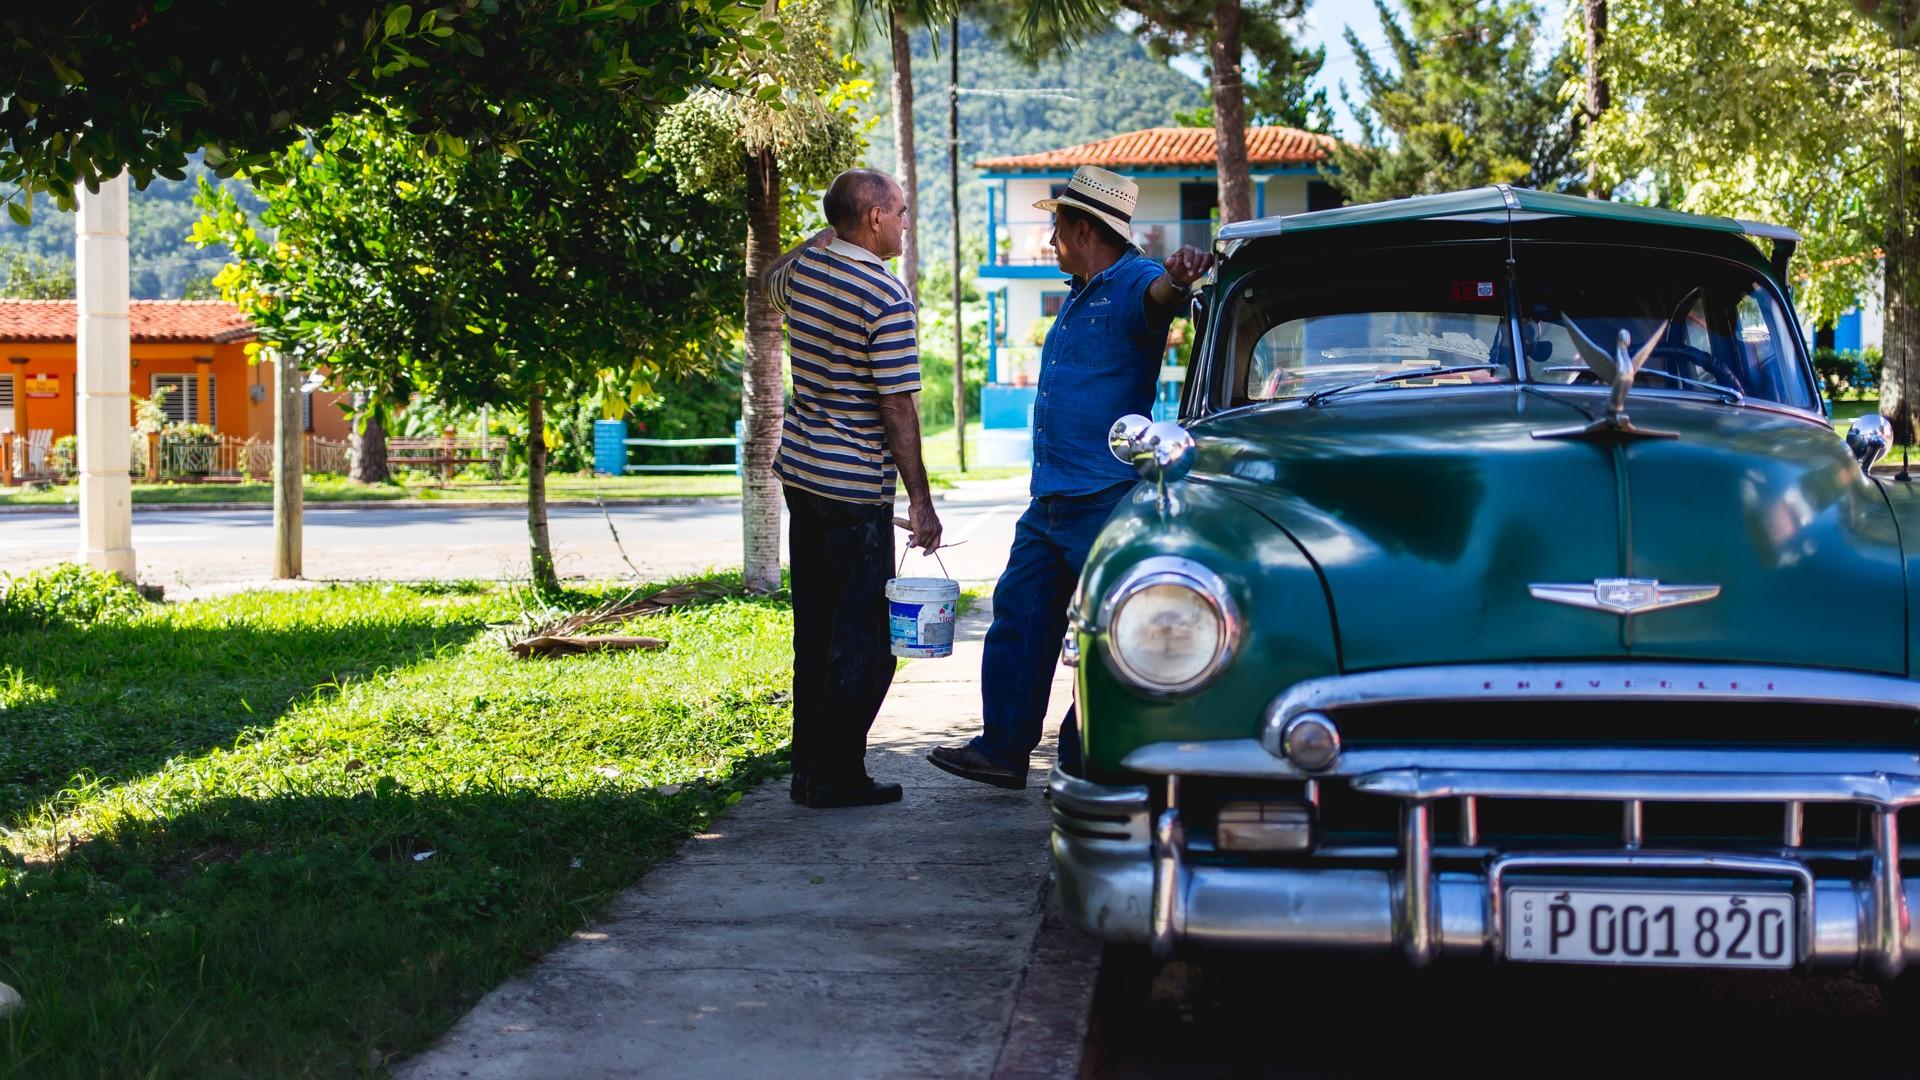 Damien-Dohmen-Photographe-Cuba-17